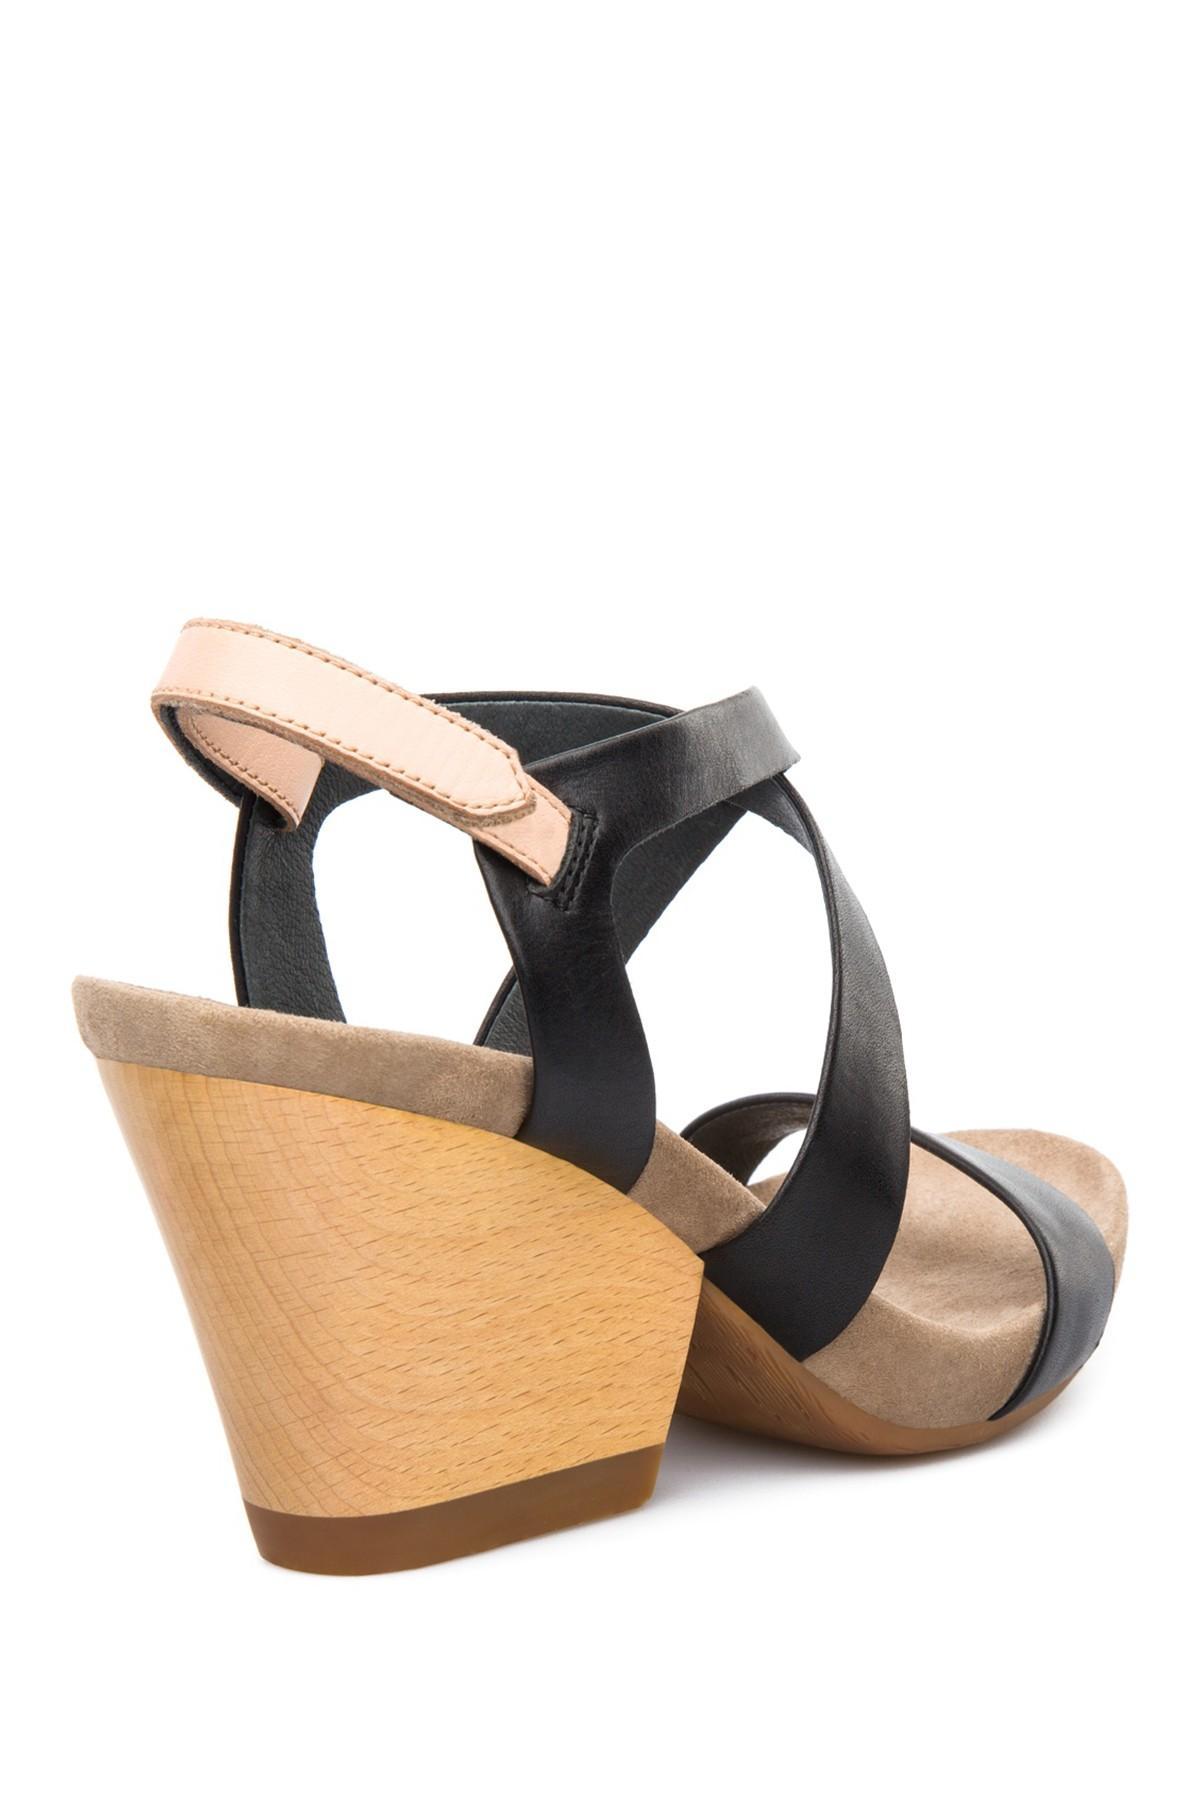 ccf0f42f0a8 Camper - Black Servolux Wood Block Heel Sandal - Lyst. View fullscreen